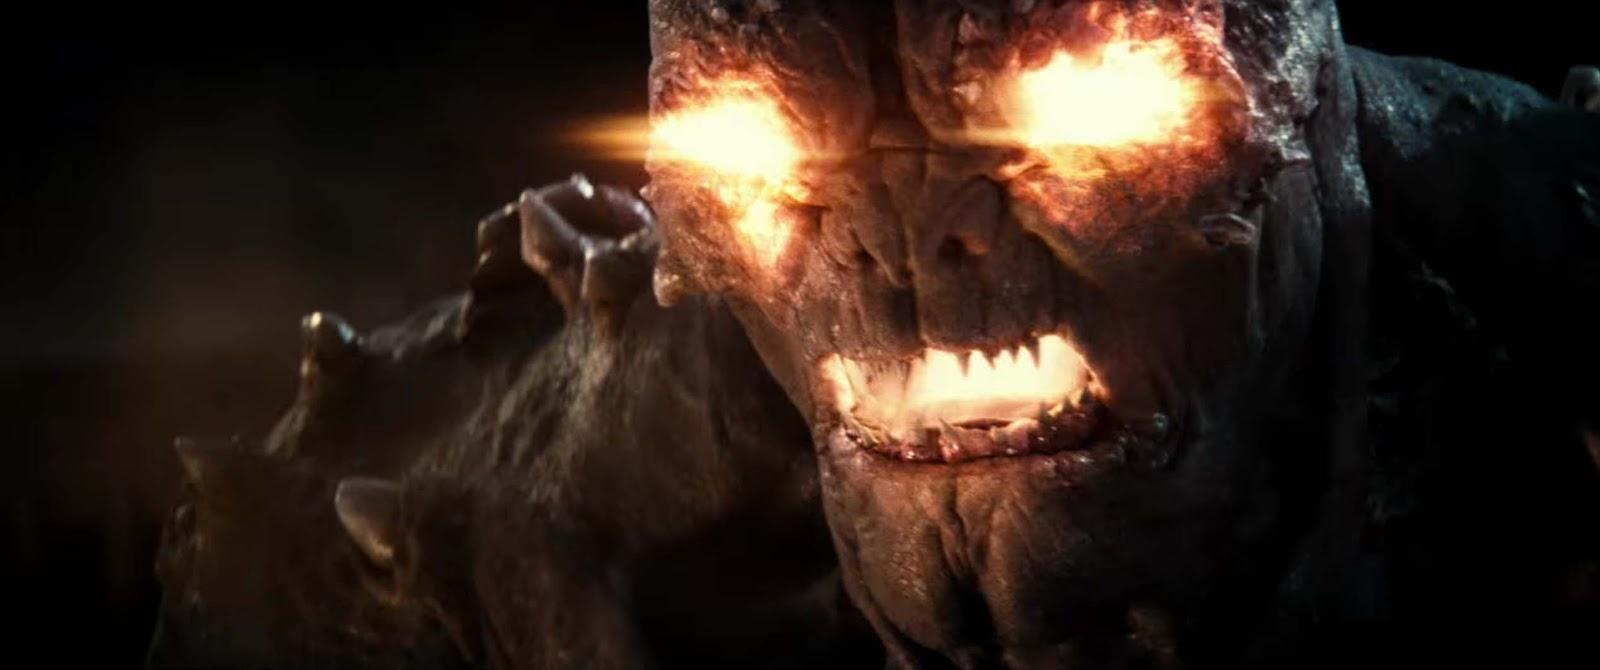 Image Result For Apocalypse Full Movie